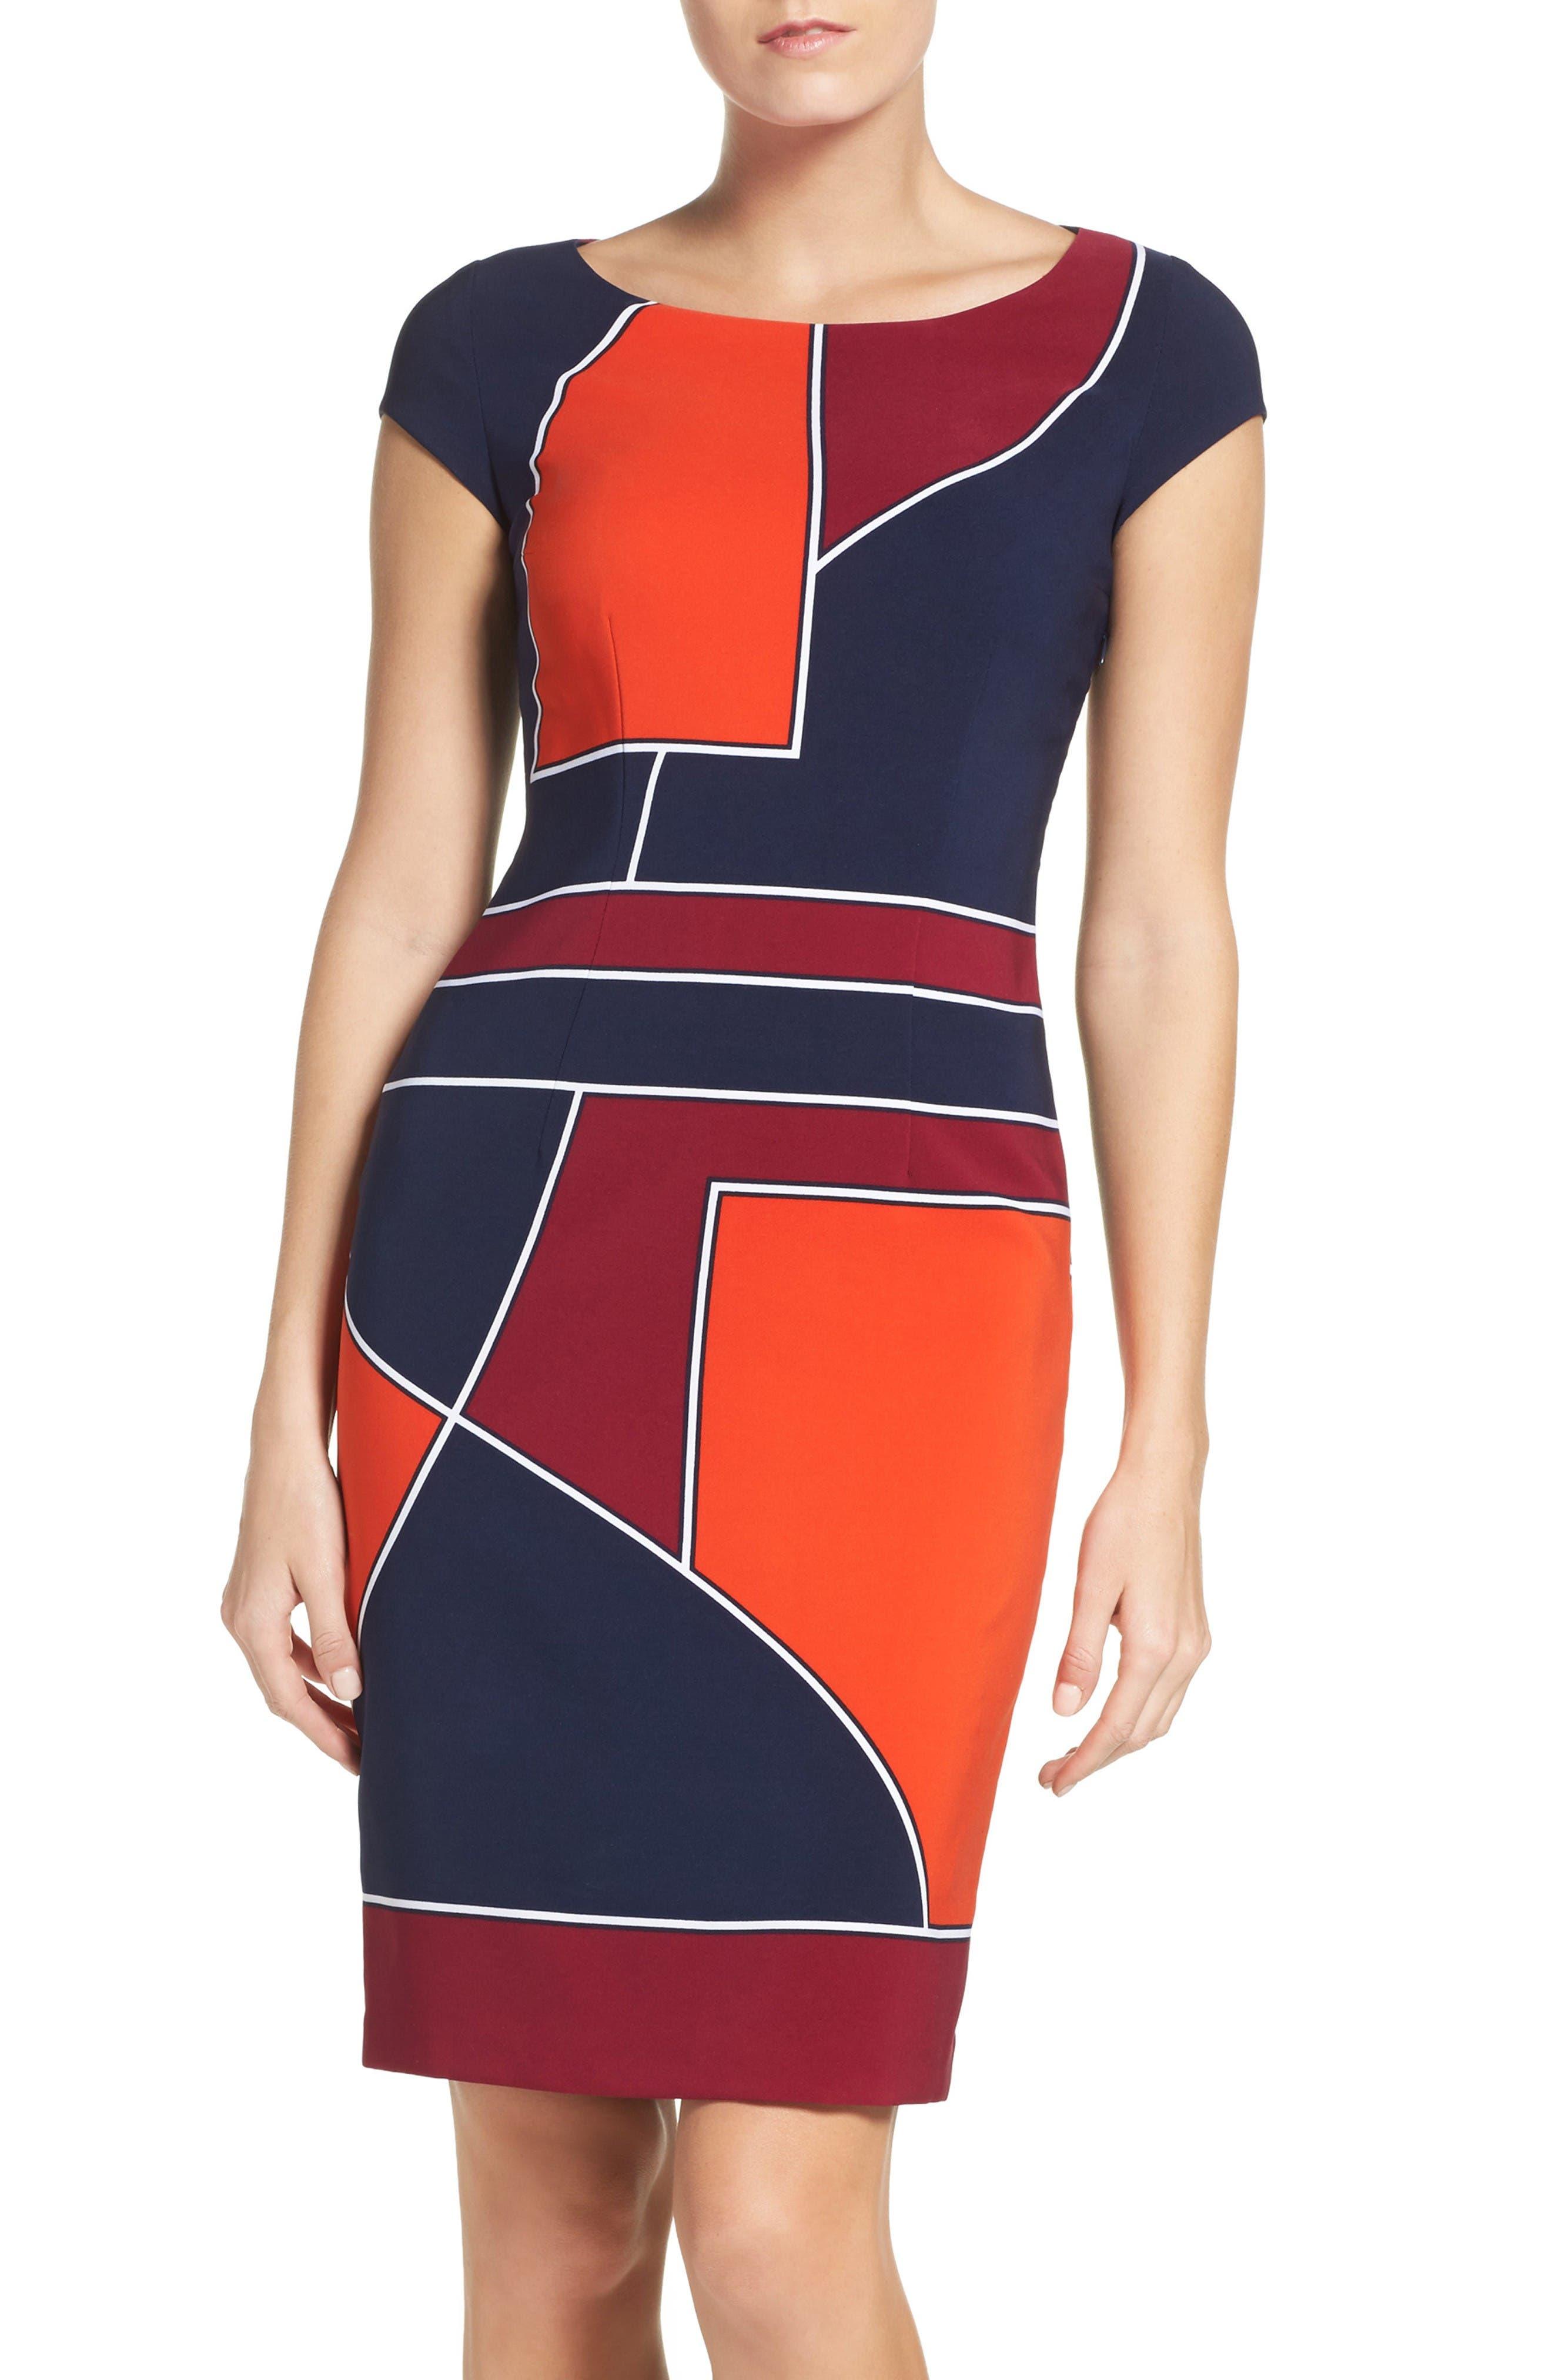 LAUNDRY BY SHELLI SEGAL Geometric Sheath Dress